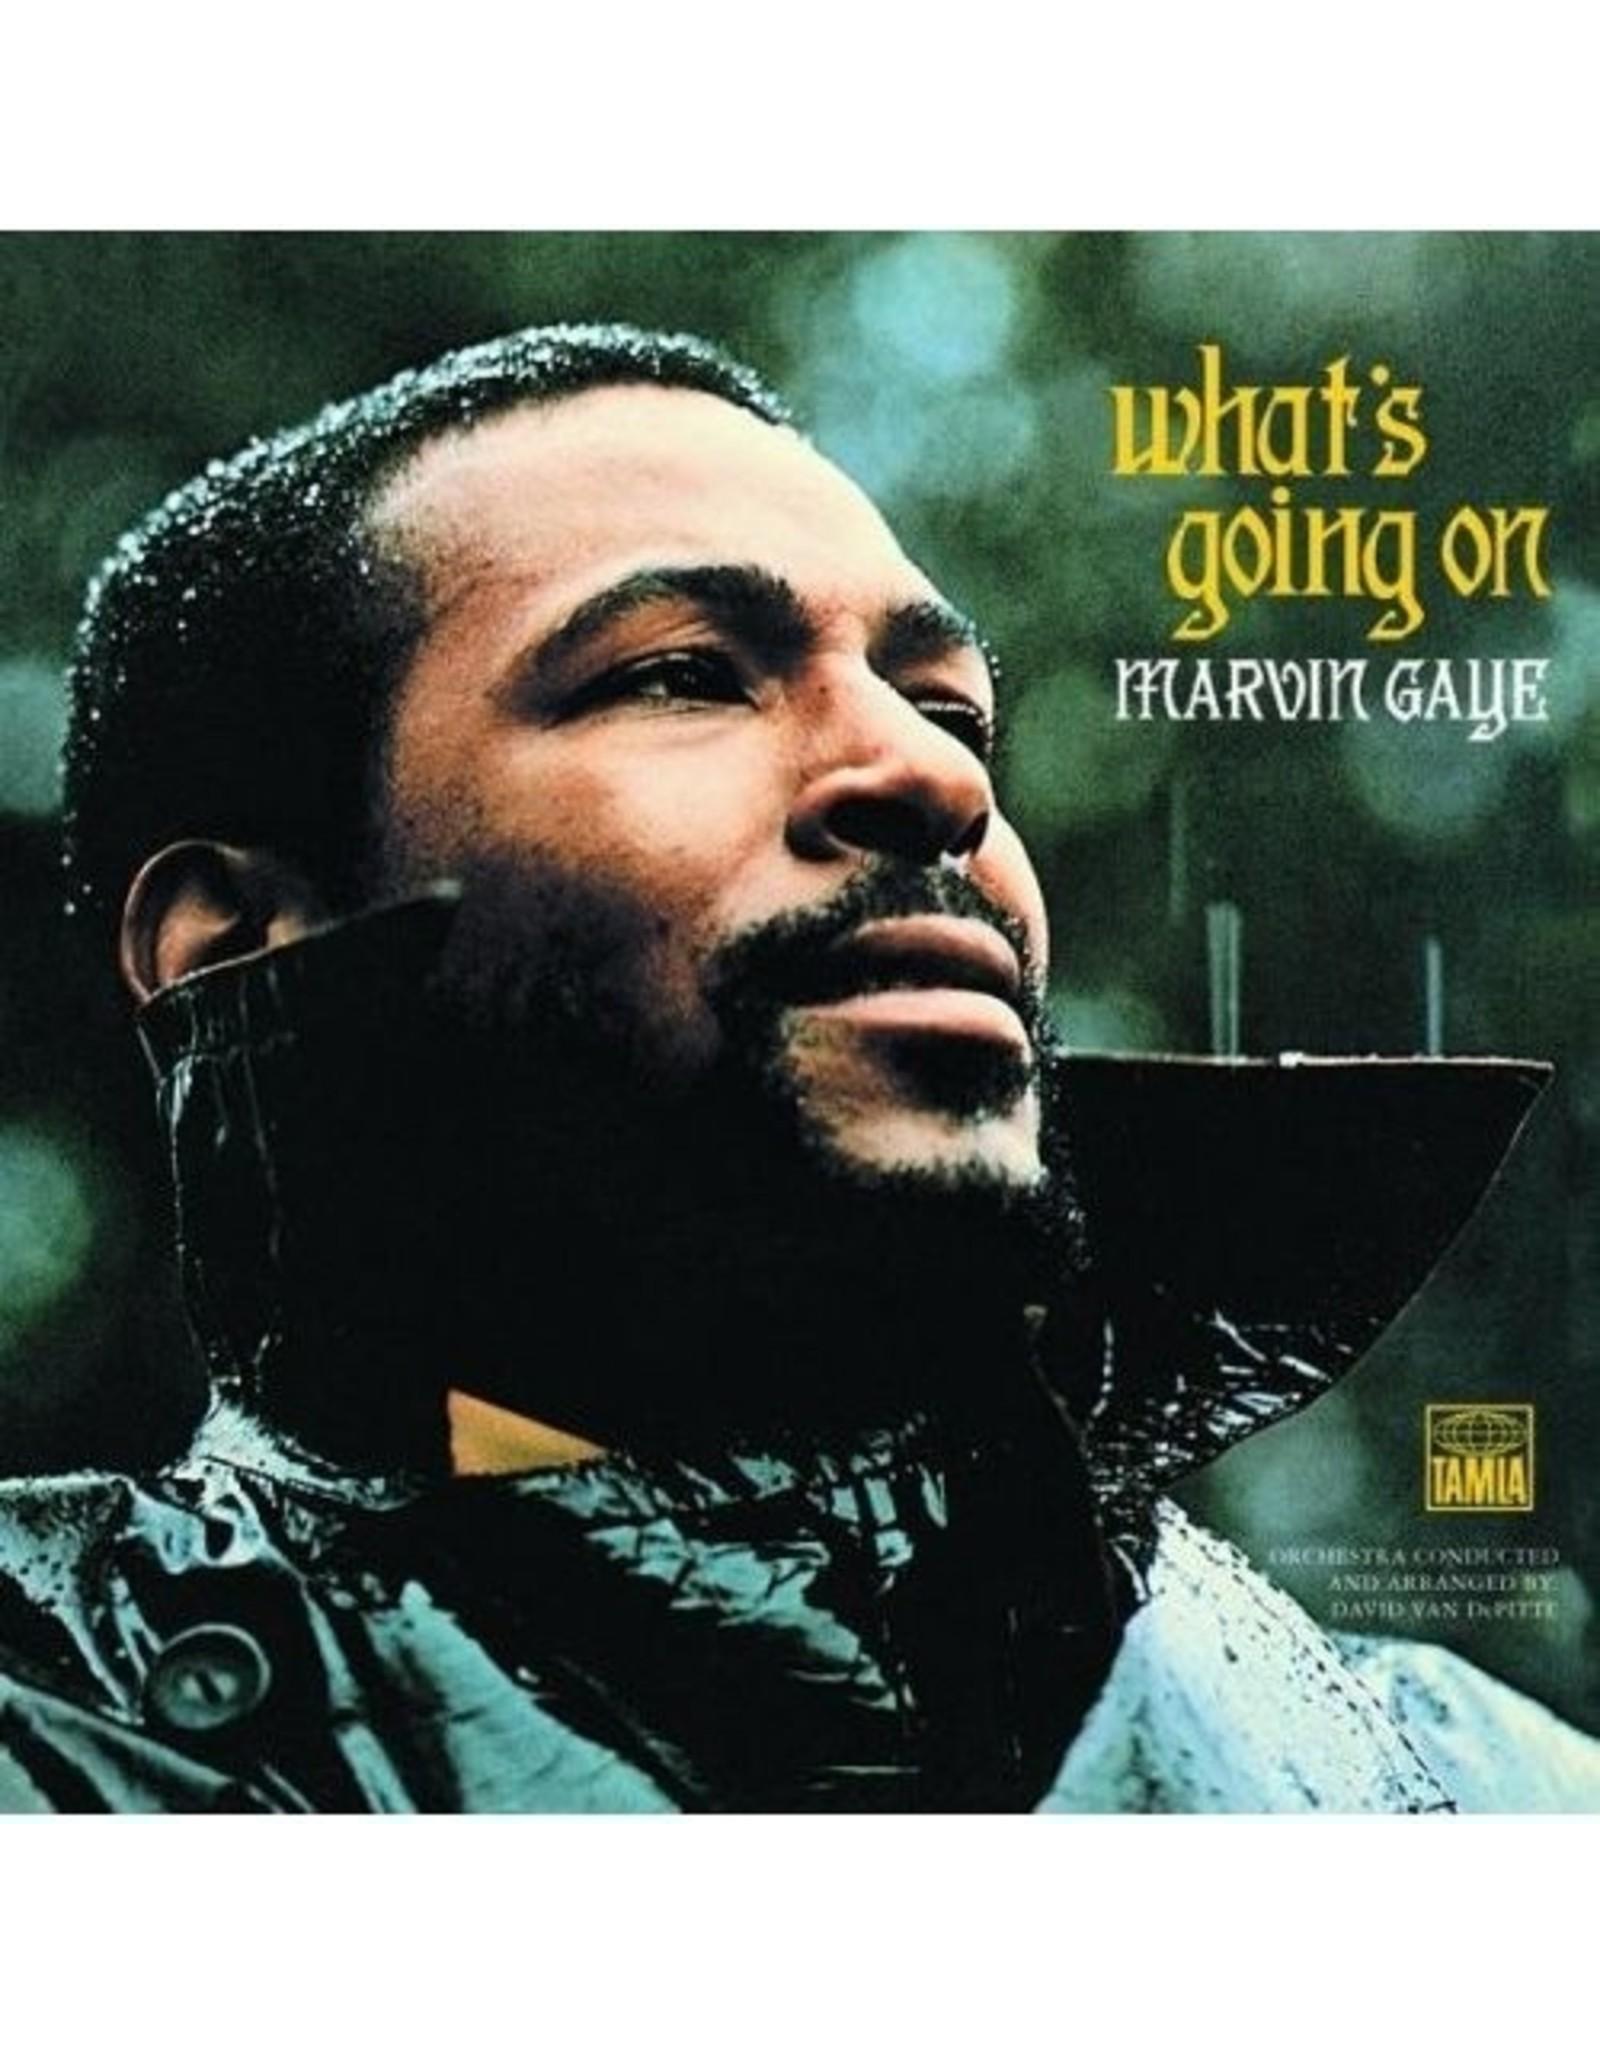 New Vinyl Marvin Gaye - What's Going On LP